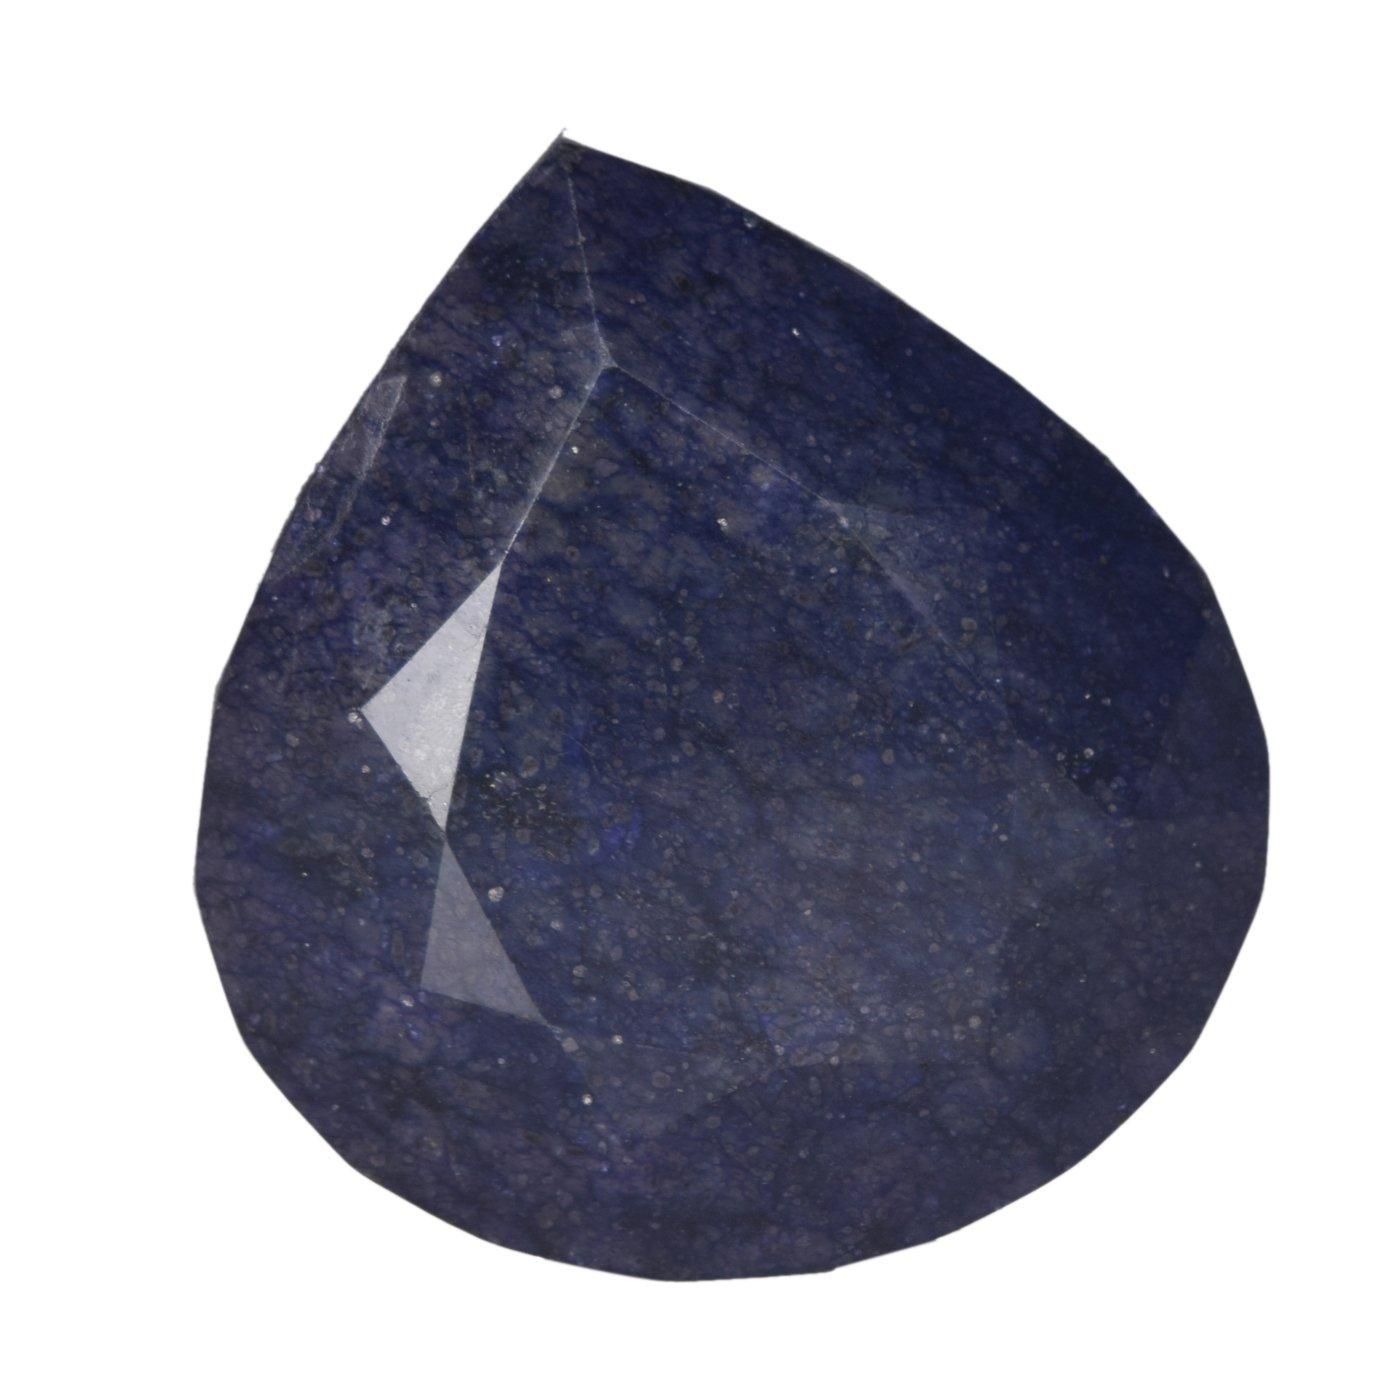 Deep Blue Natural Sapphires Gemstone EGLCertified 2000 Ct.(approximate) Pear Cut Natural Huge Blue Sapphire Loose Gemstone CB-366